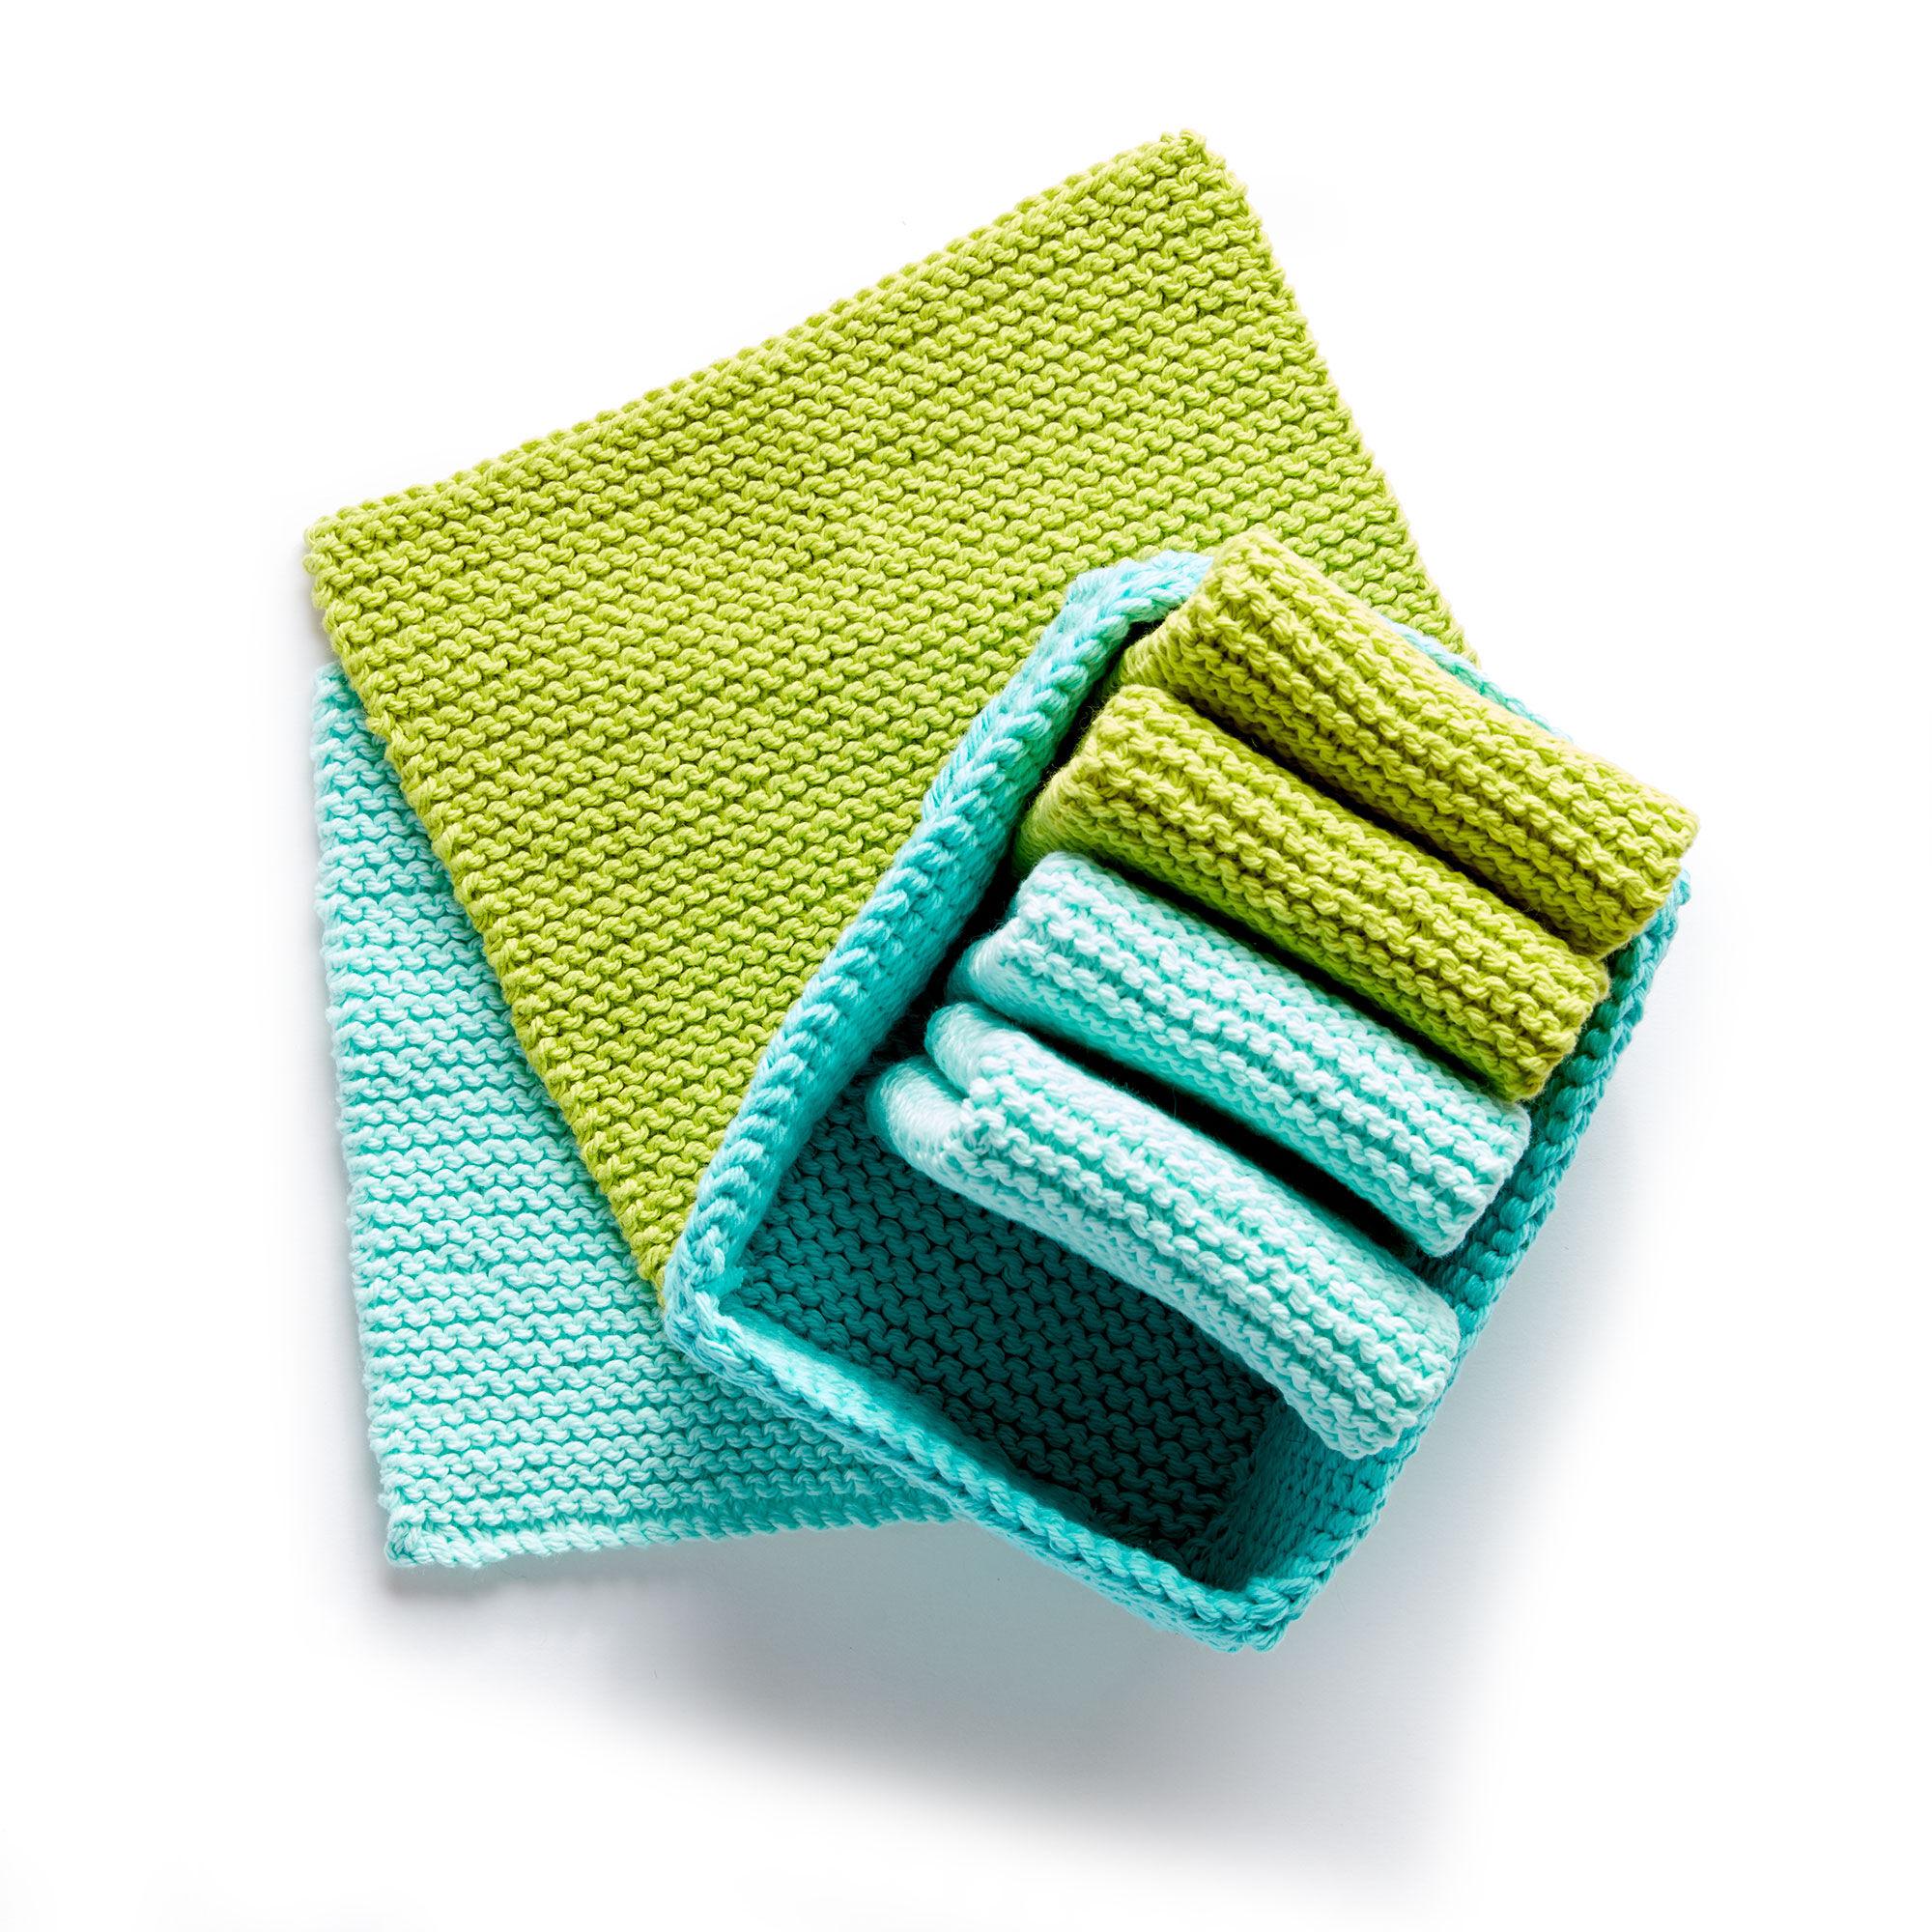 Lily Sugar\'n Cream Tidy Up Knit Dishcloth and Basket | Yarnspirations